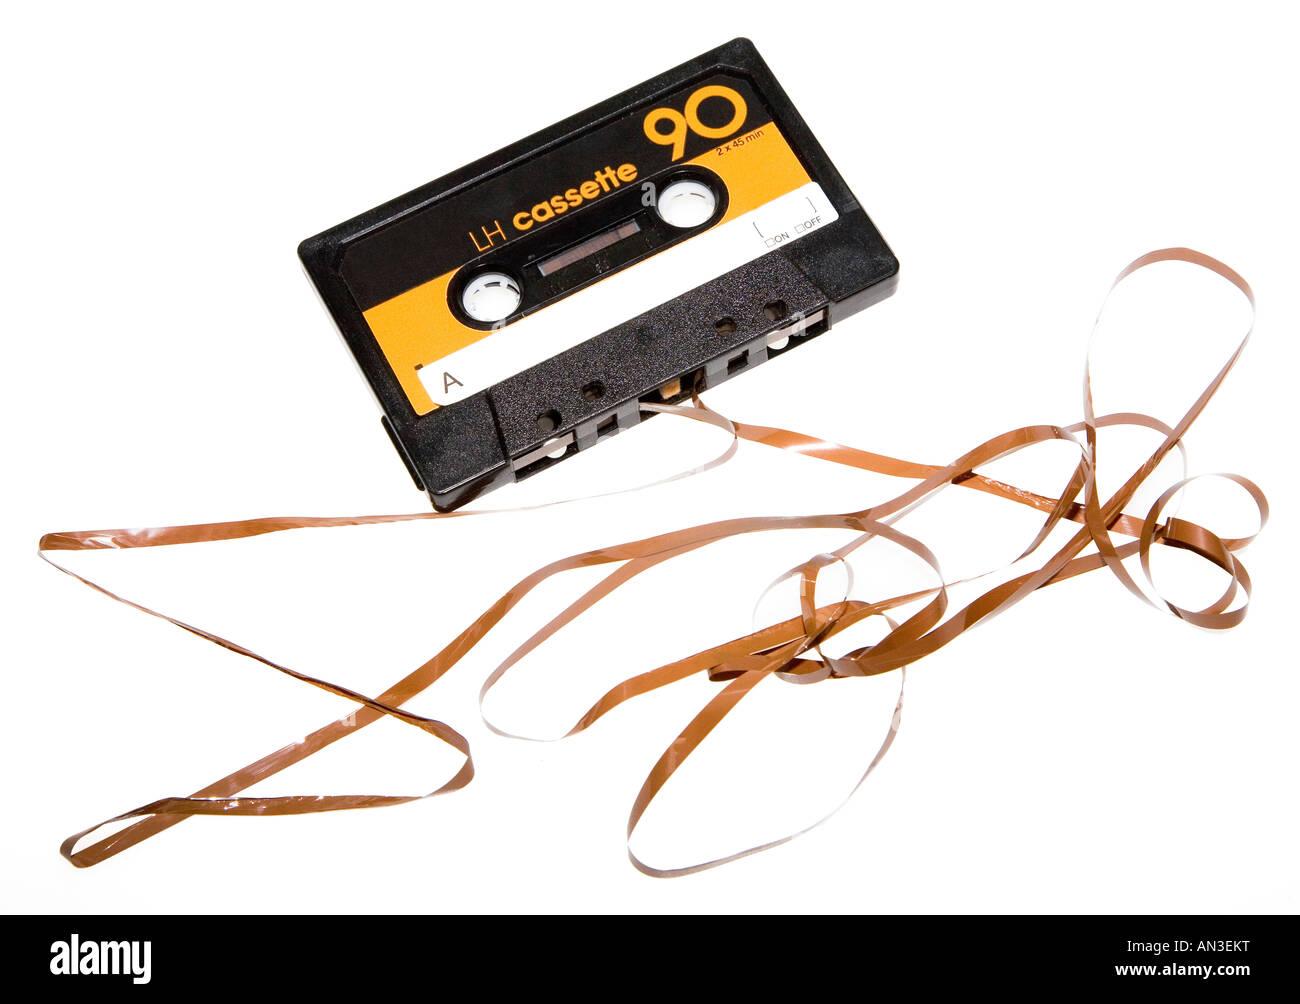 Damaged audio casette tape - Stock Image